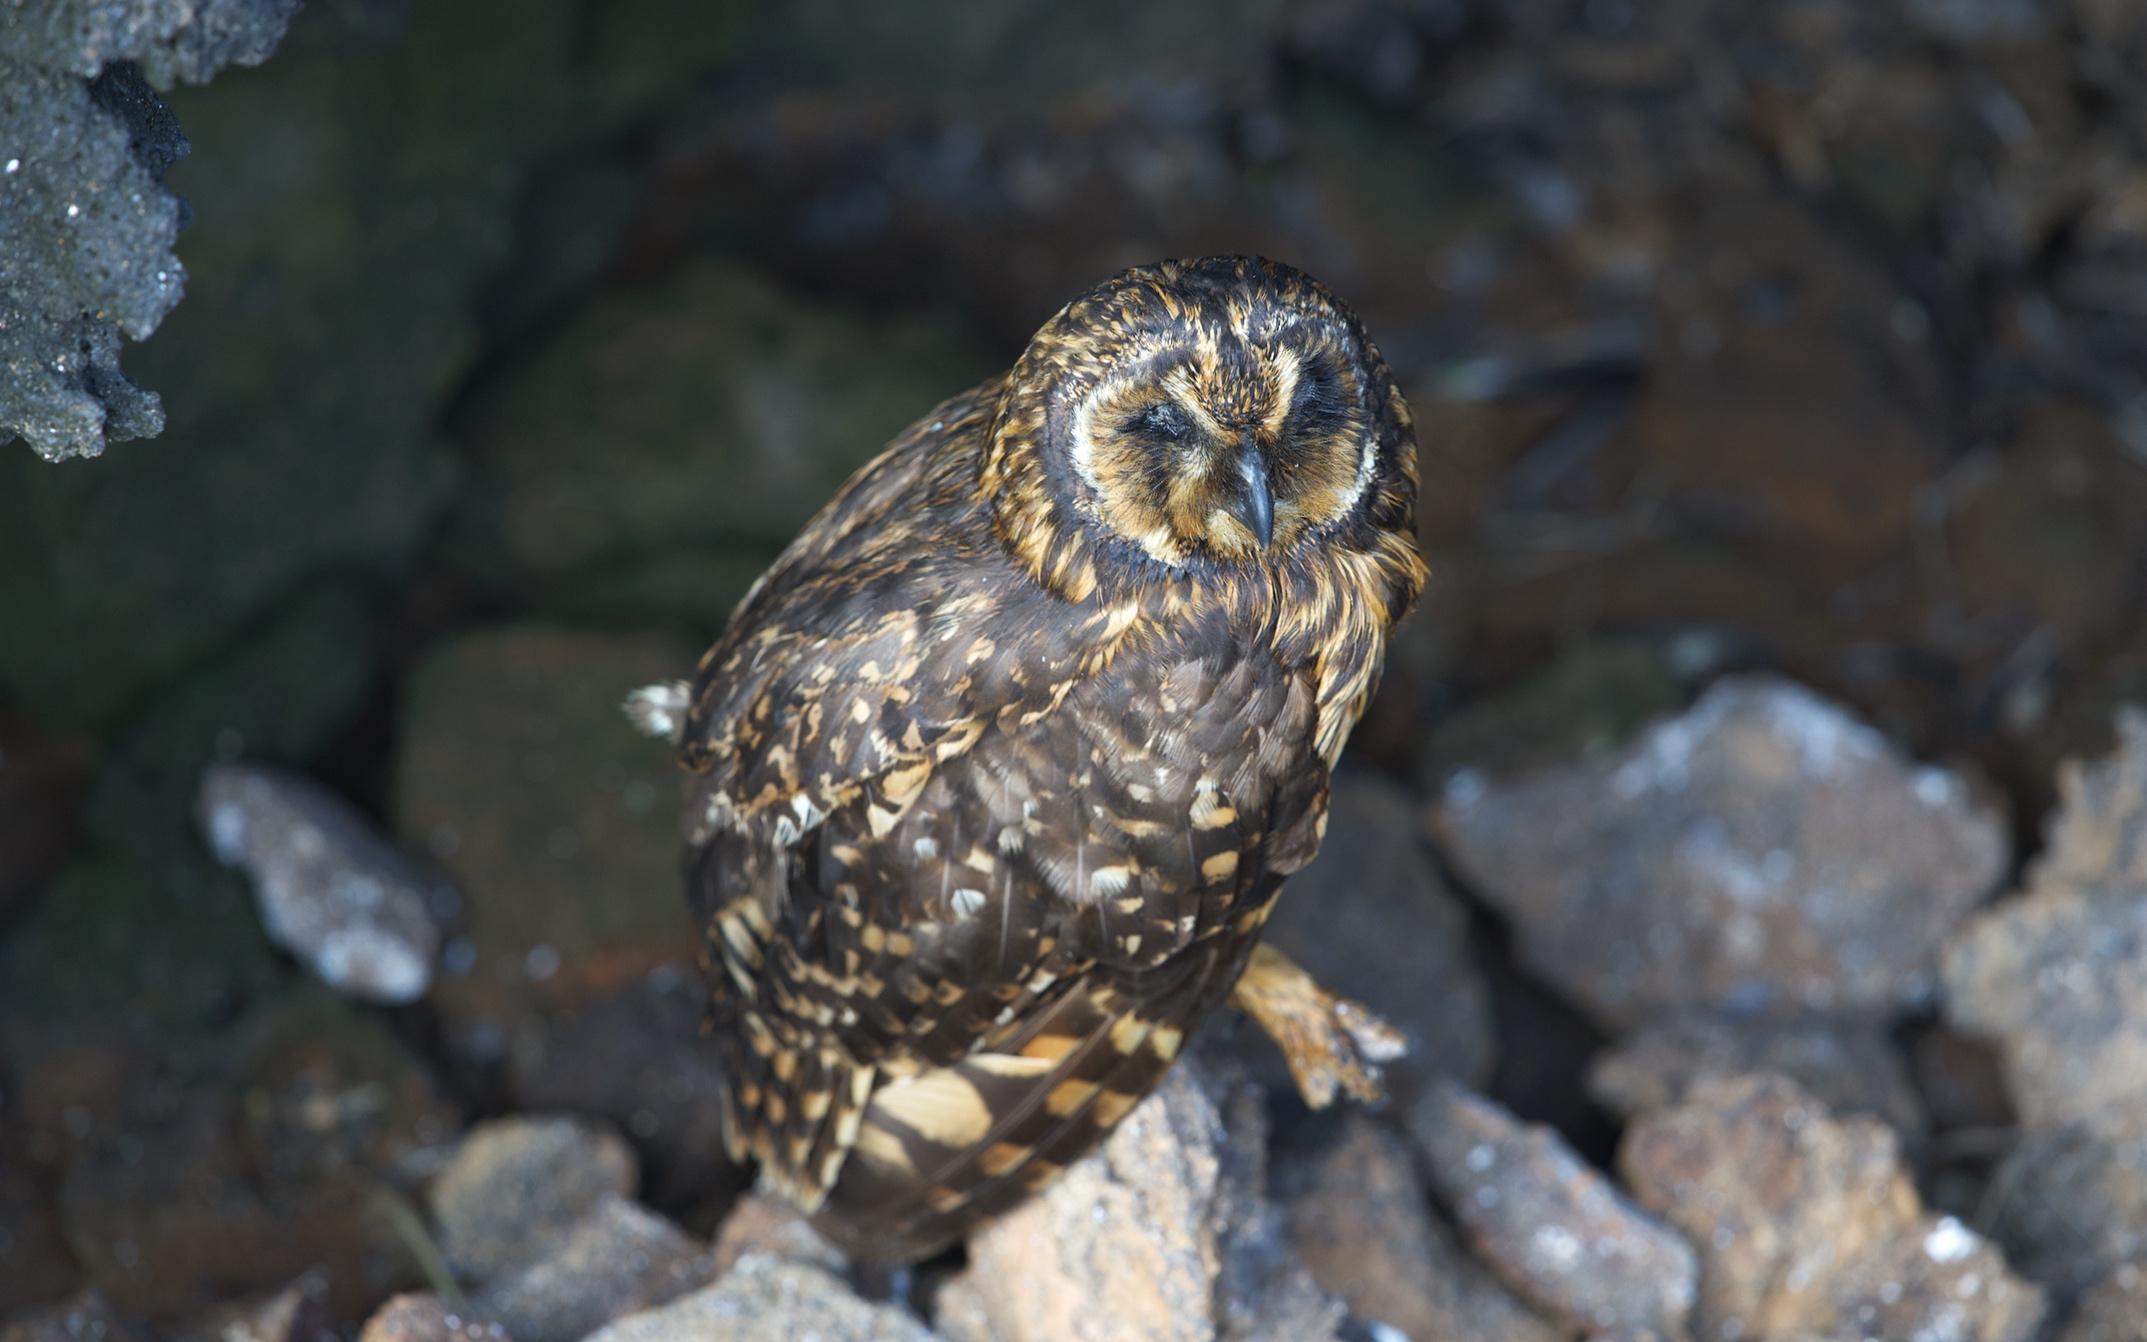 …..like this beautiful owl.